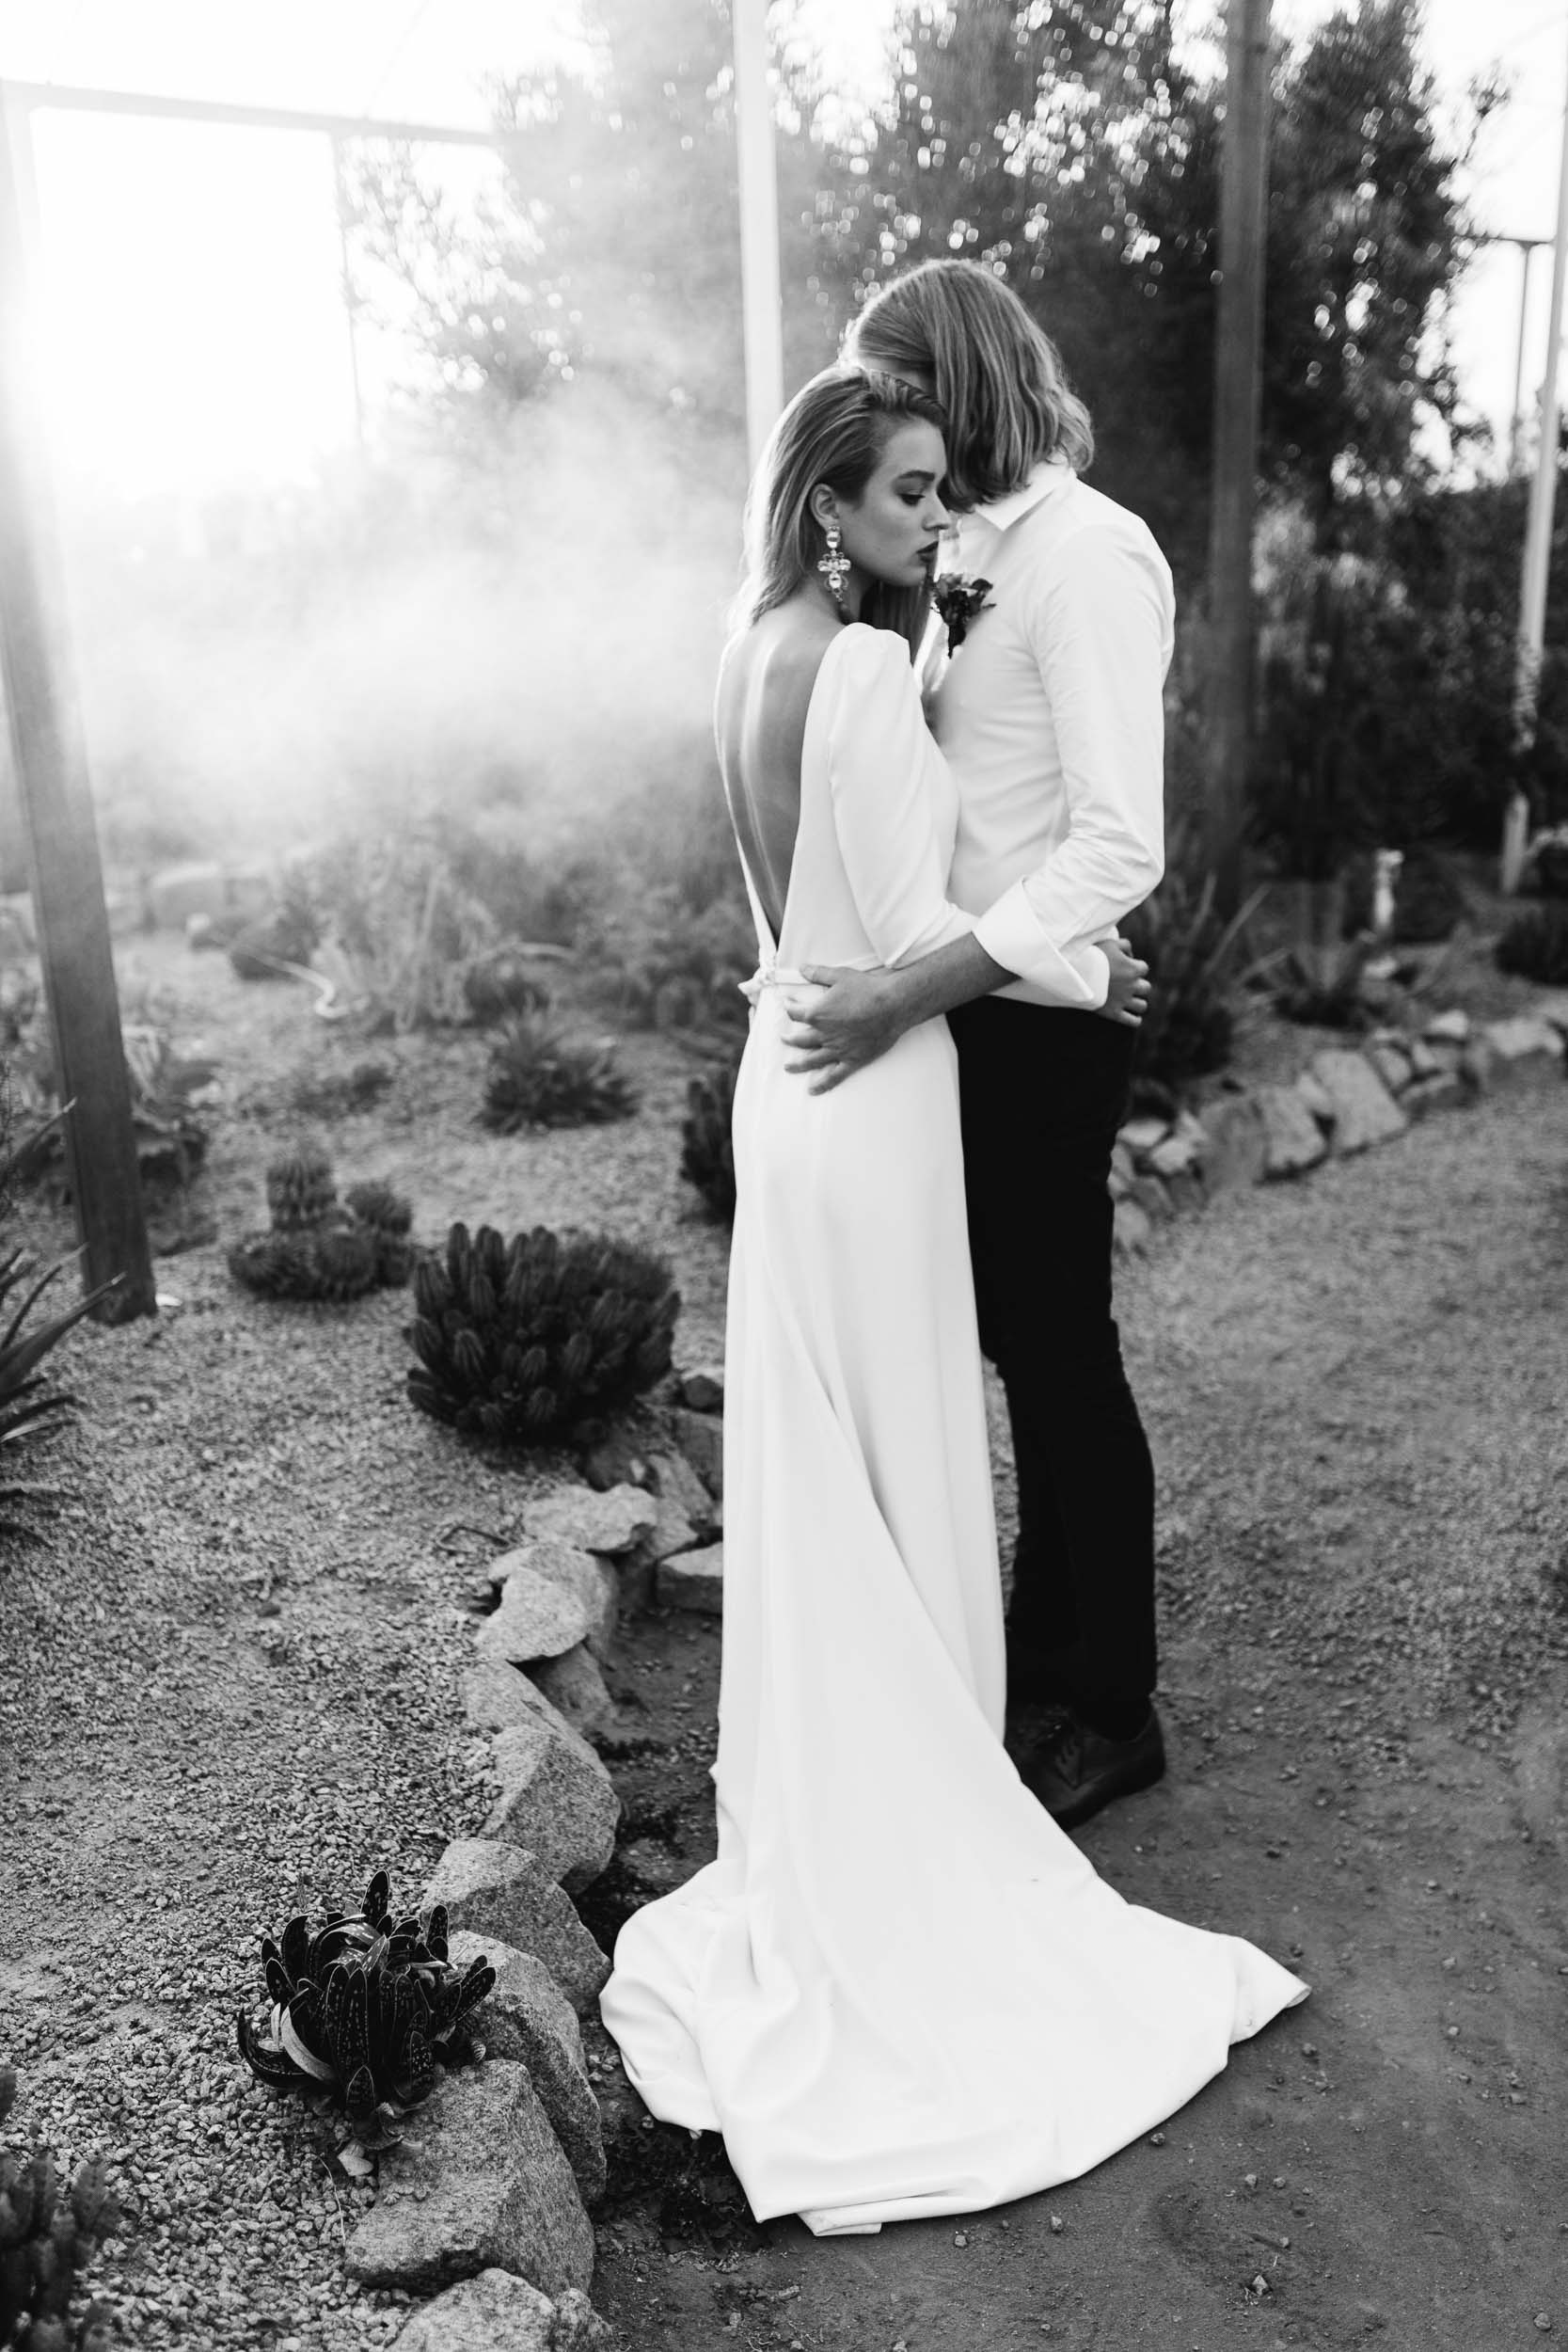 Kas-Richards-Ruby-and-James-Stylist-Cactus-Country-Karen-Willis-Holmes-Bridal-One-Heart-Studios-Boho-Wedding-138.jpg